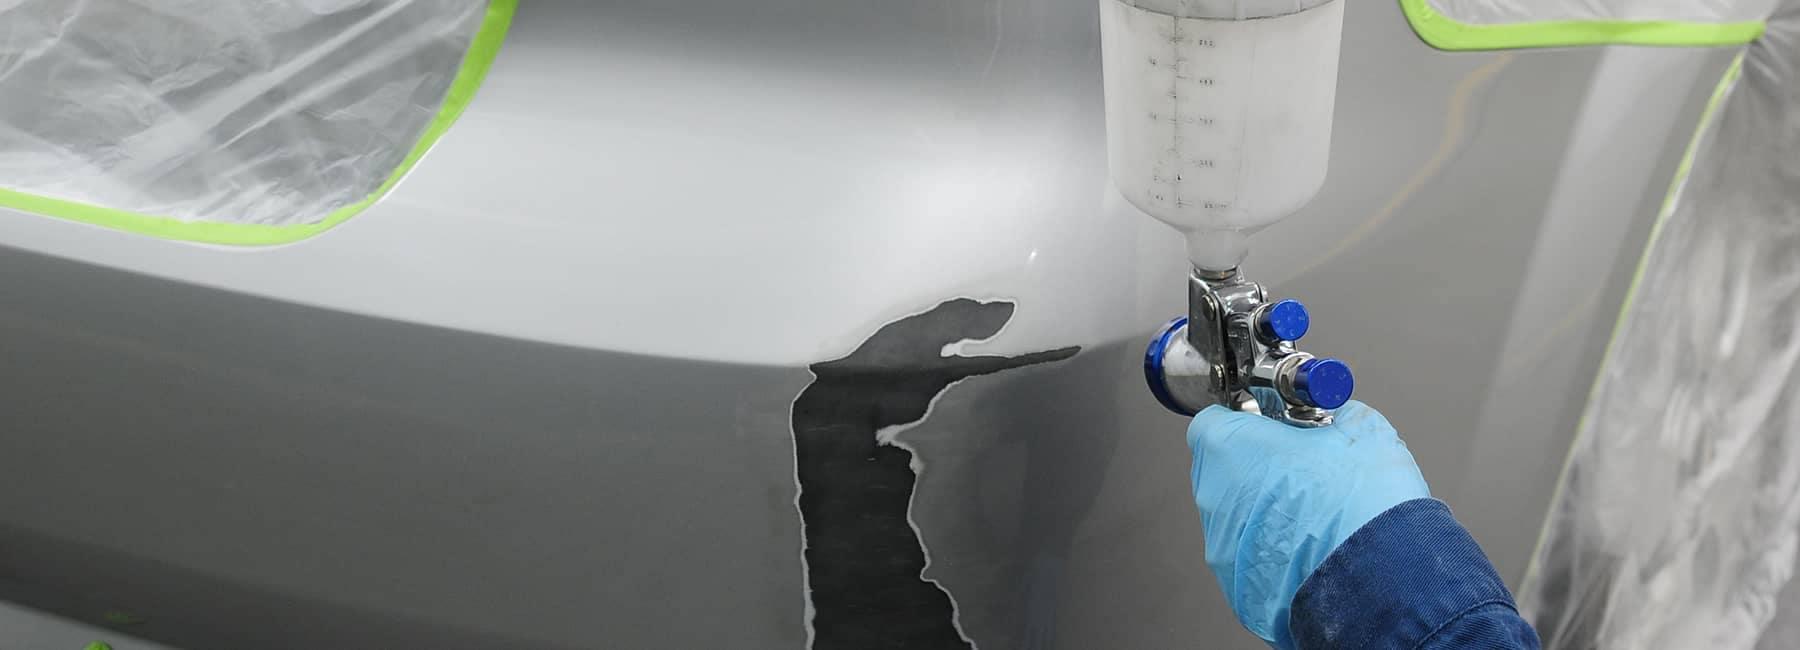 painting car exterior